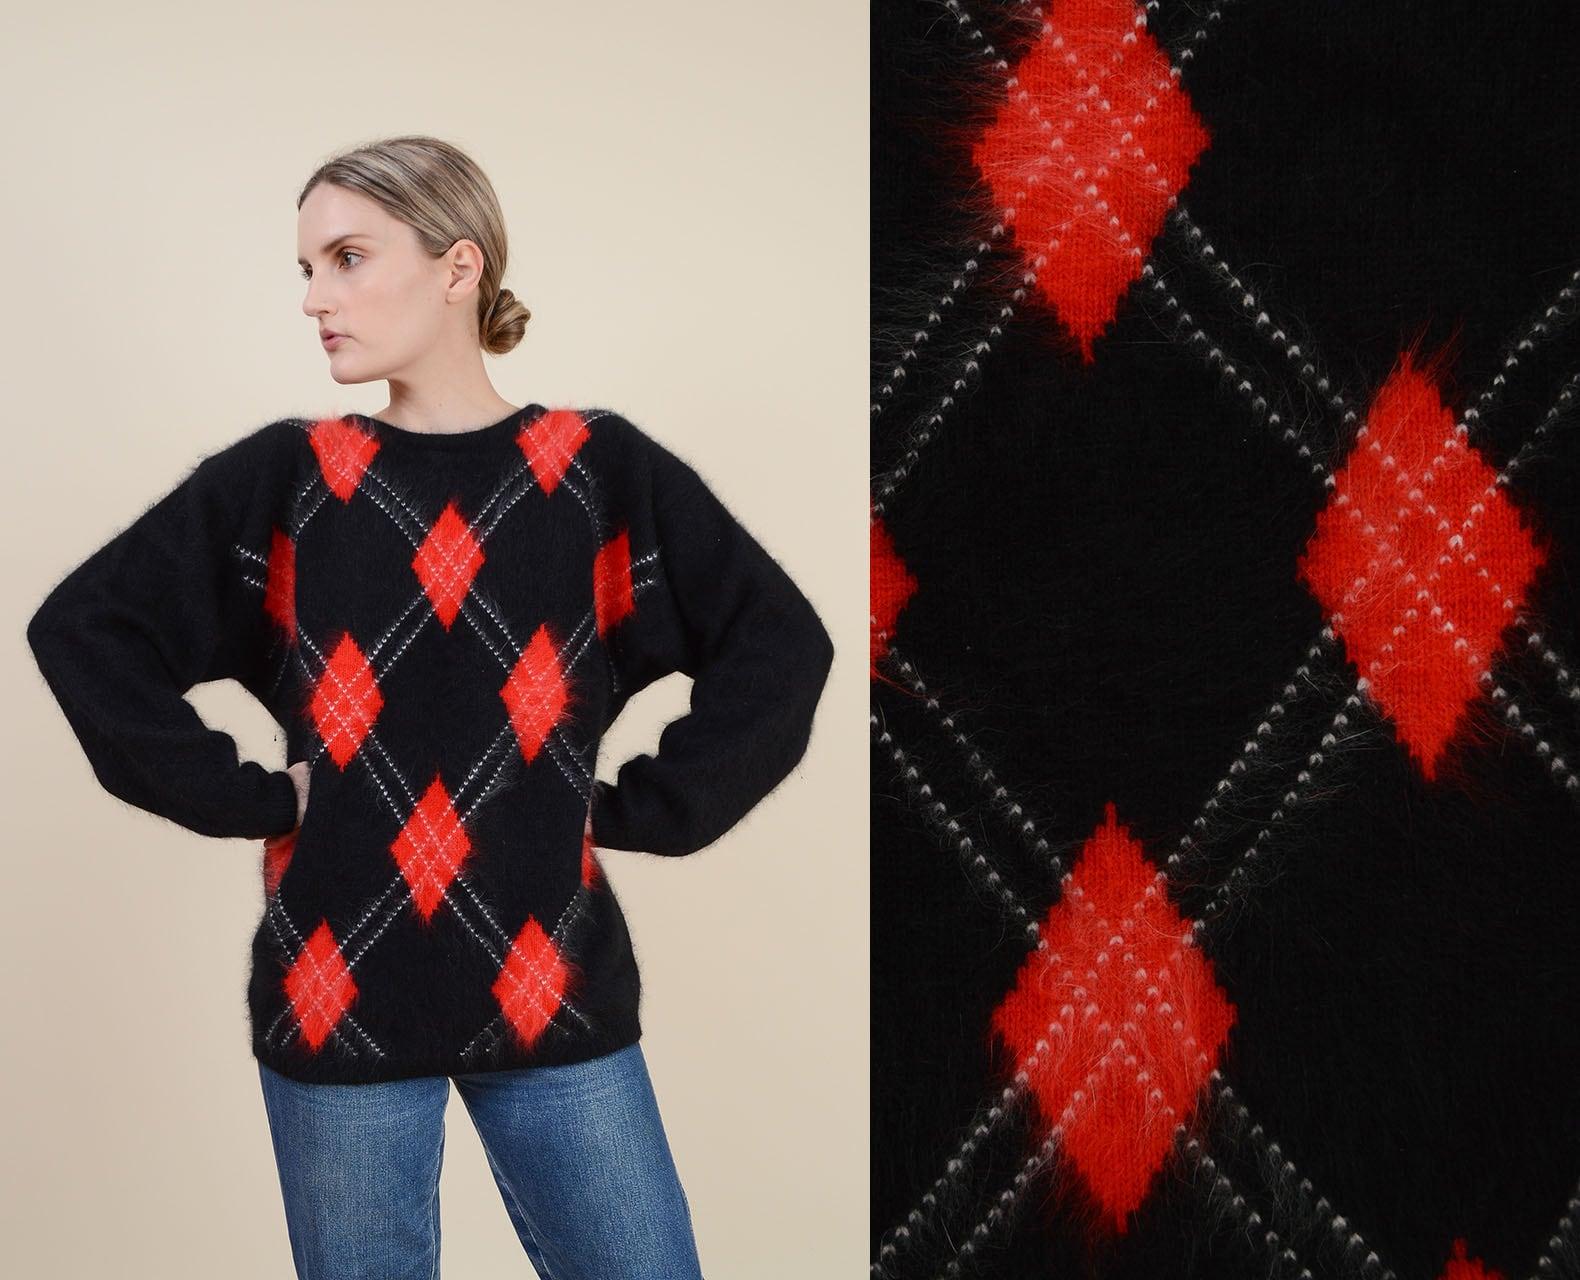 80s Sweatshirts, Sweaters, Vests | Women Vintage Black Argyle Sweater  Plush Angora Lambswool Knit Pullover Size S M $40.00 AT vintagedancer.com